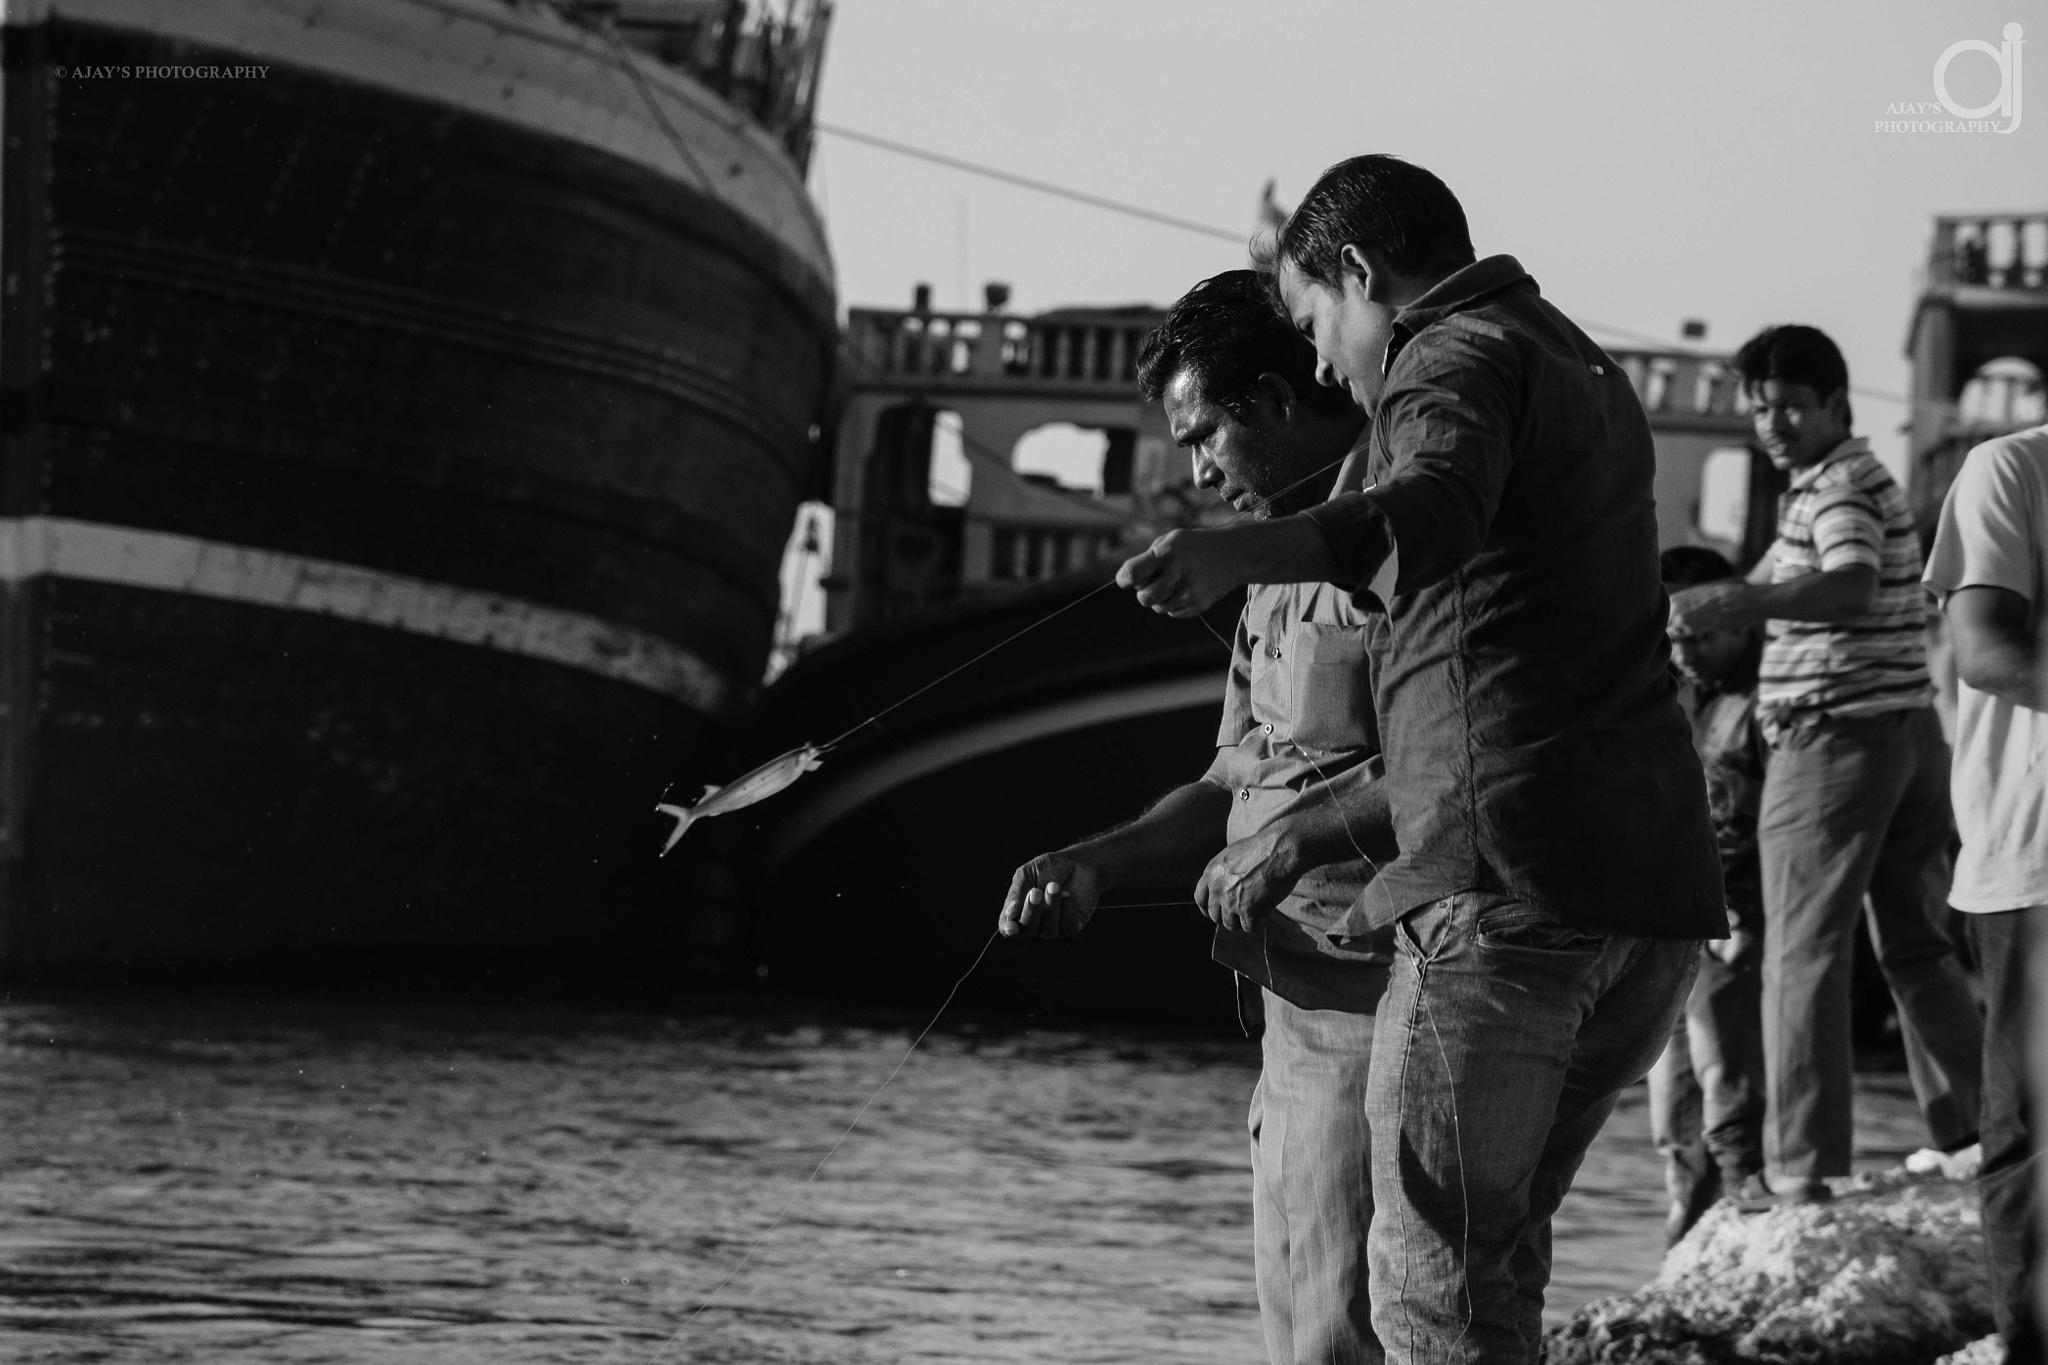 the catch by Ajay Harikumar